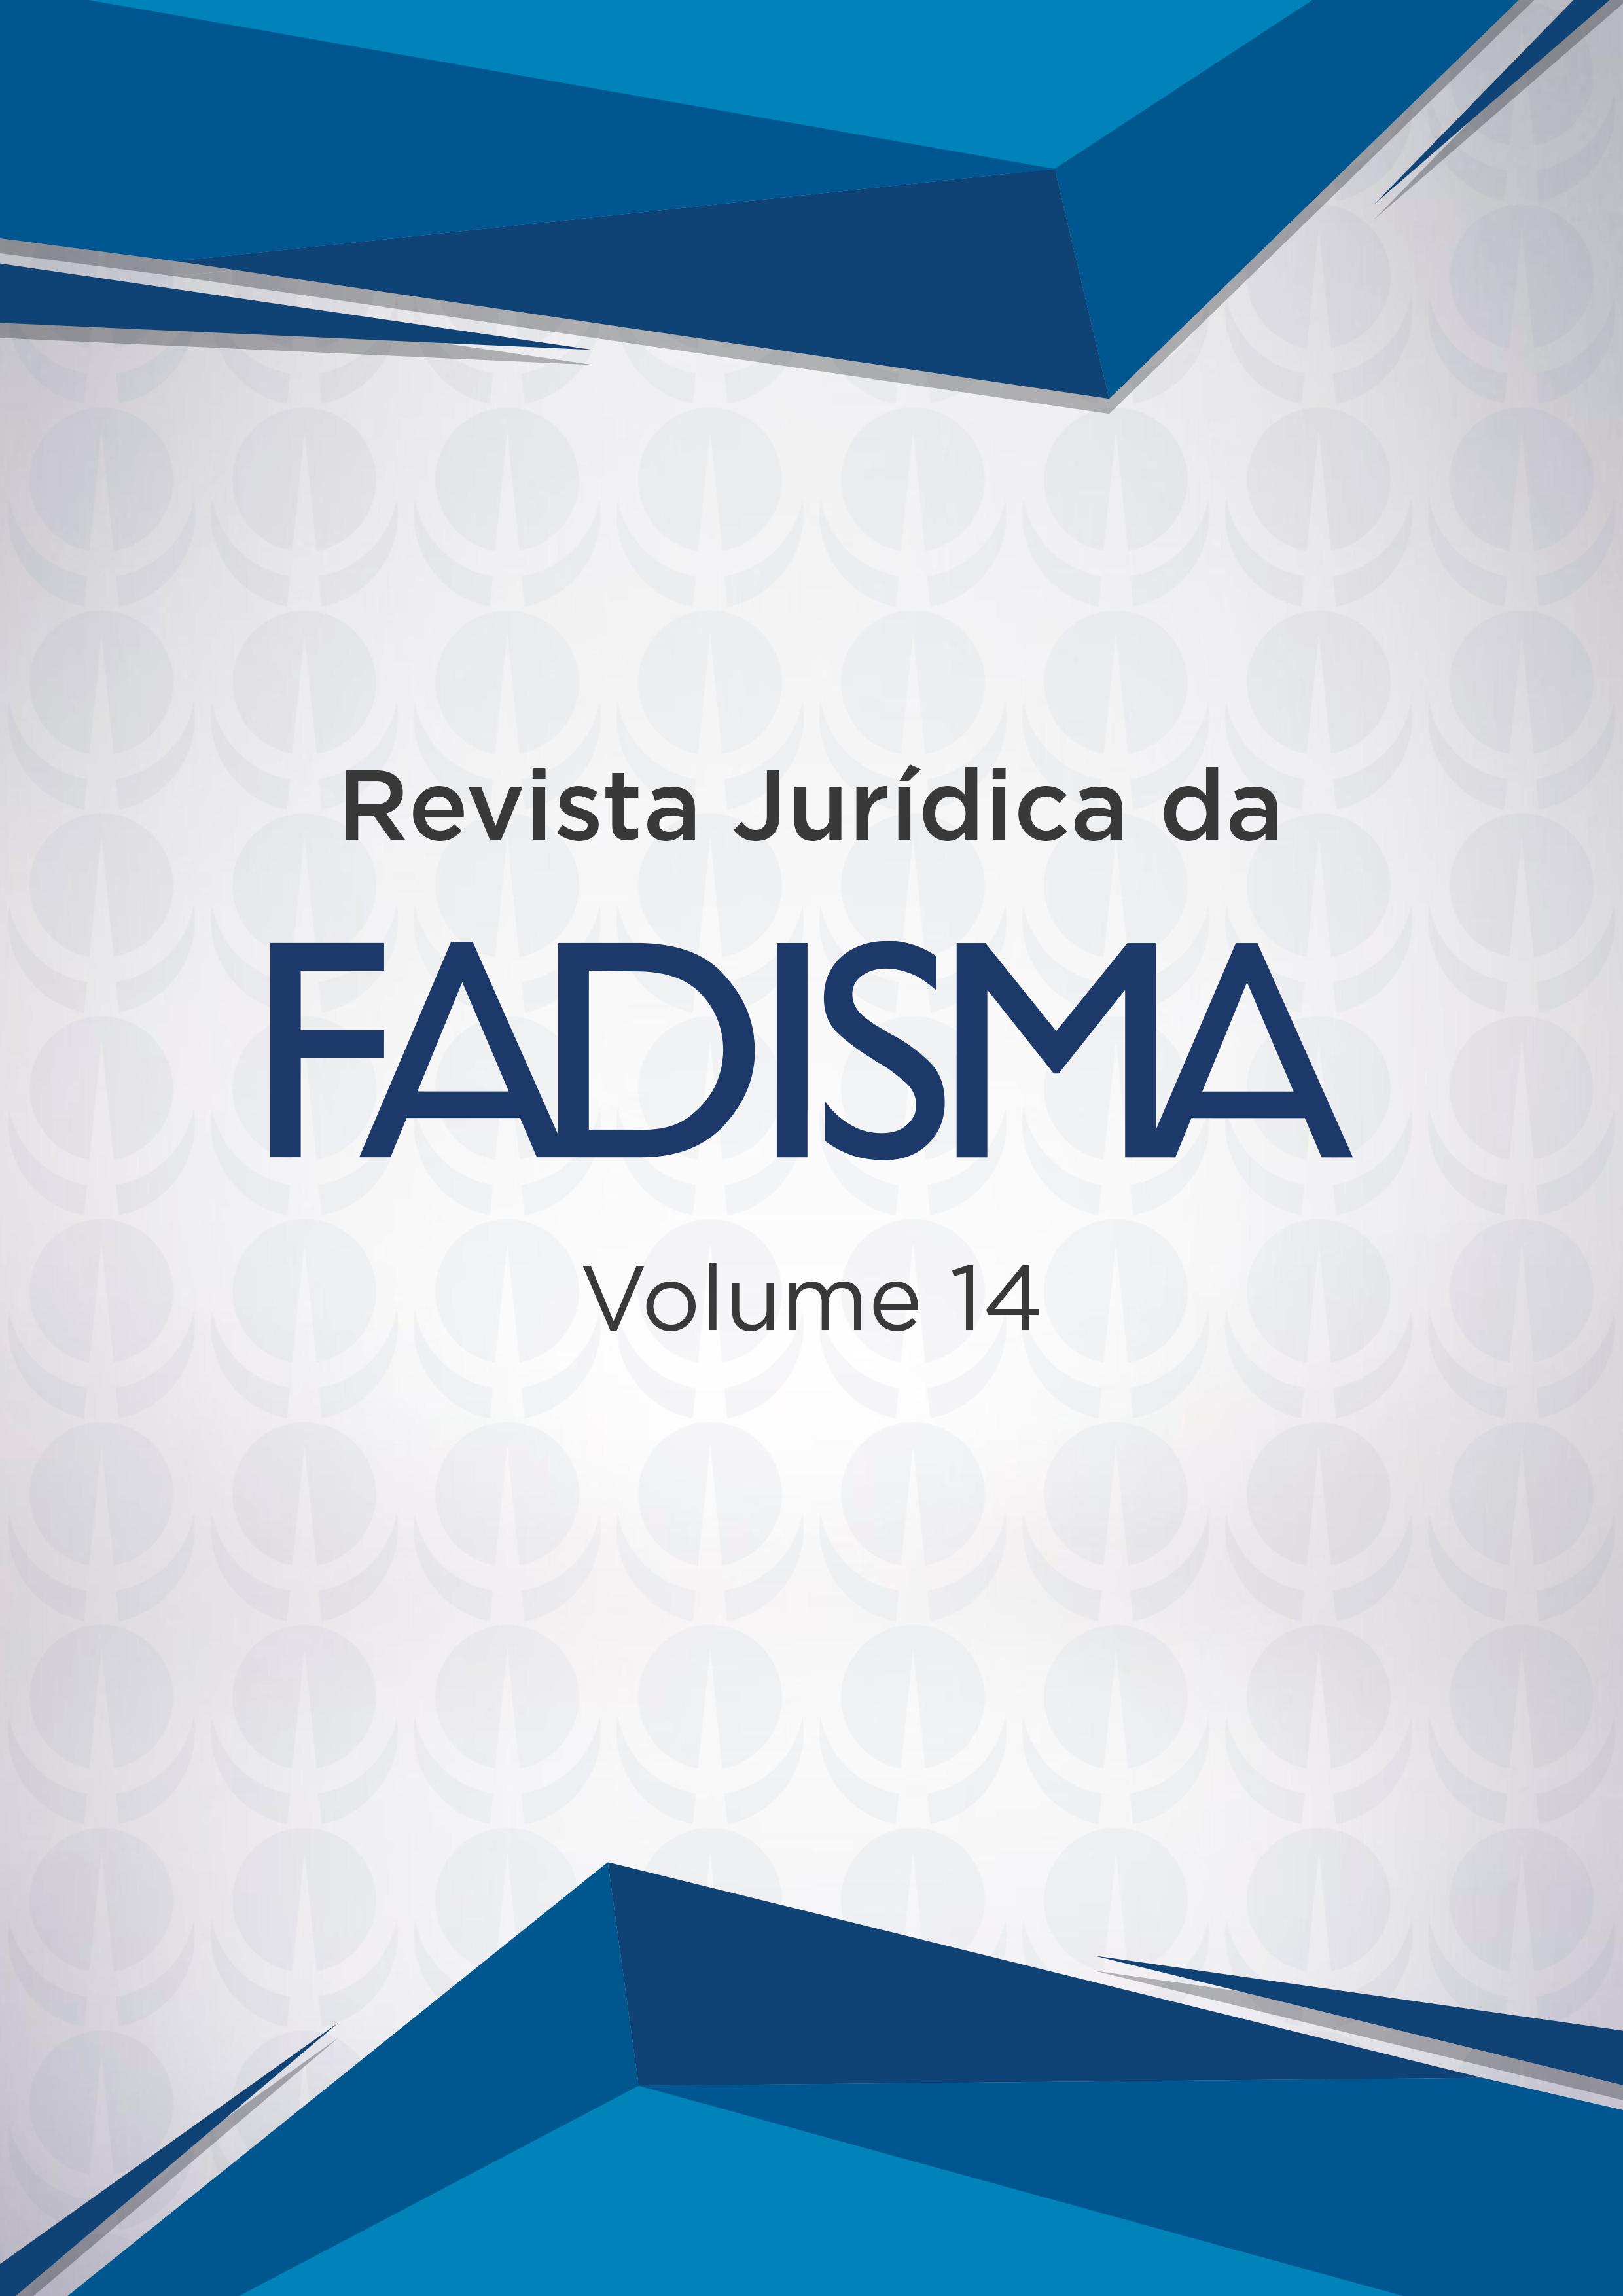 Revista Jurídica da FADISMA VOL 14